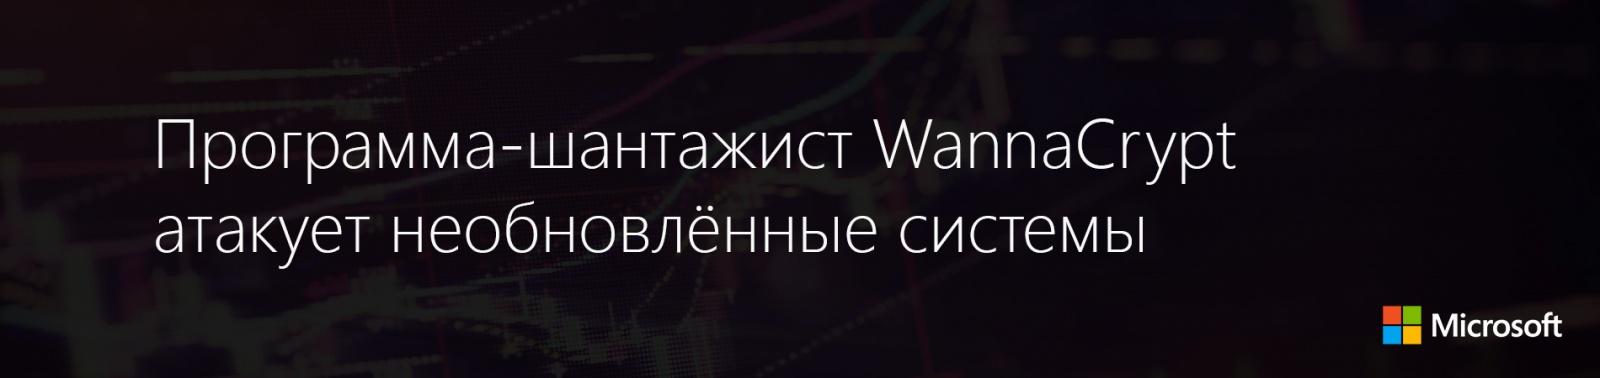 Программа-шантажист WannaCrypt атакует необновлённые системы - 1